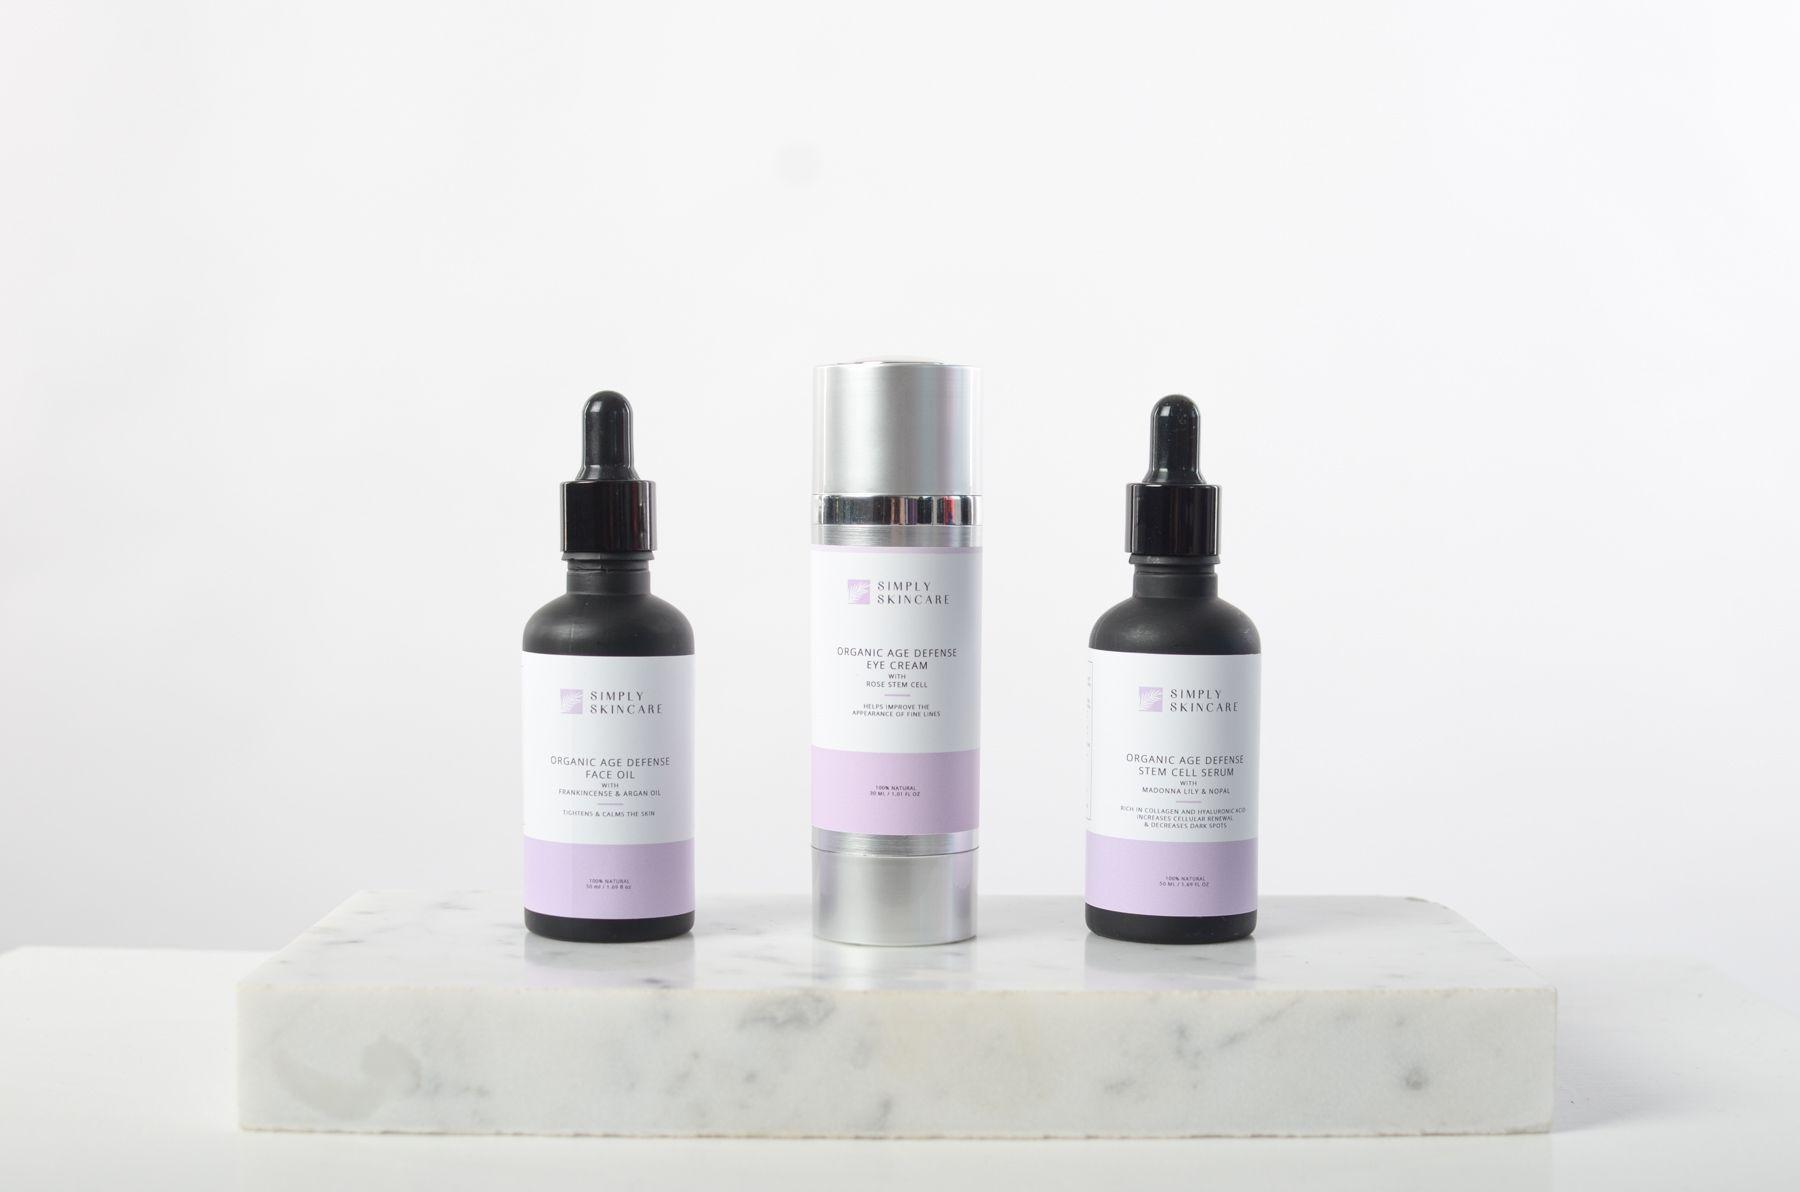 Simply Skincare Co Ltd